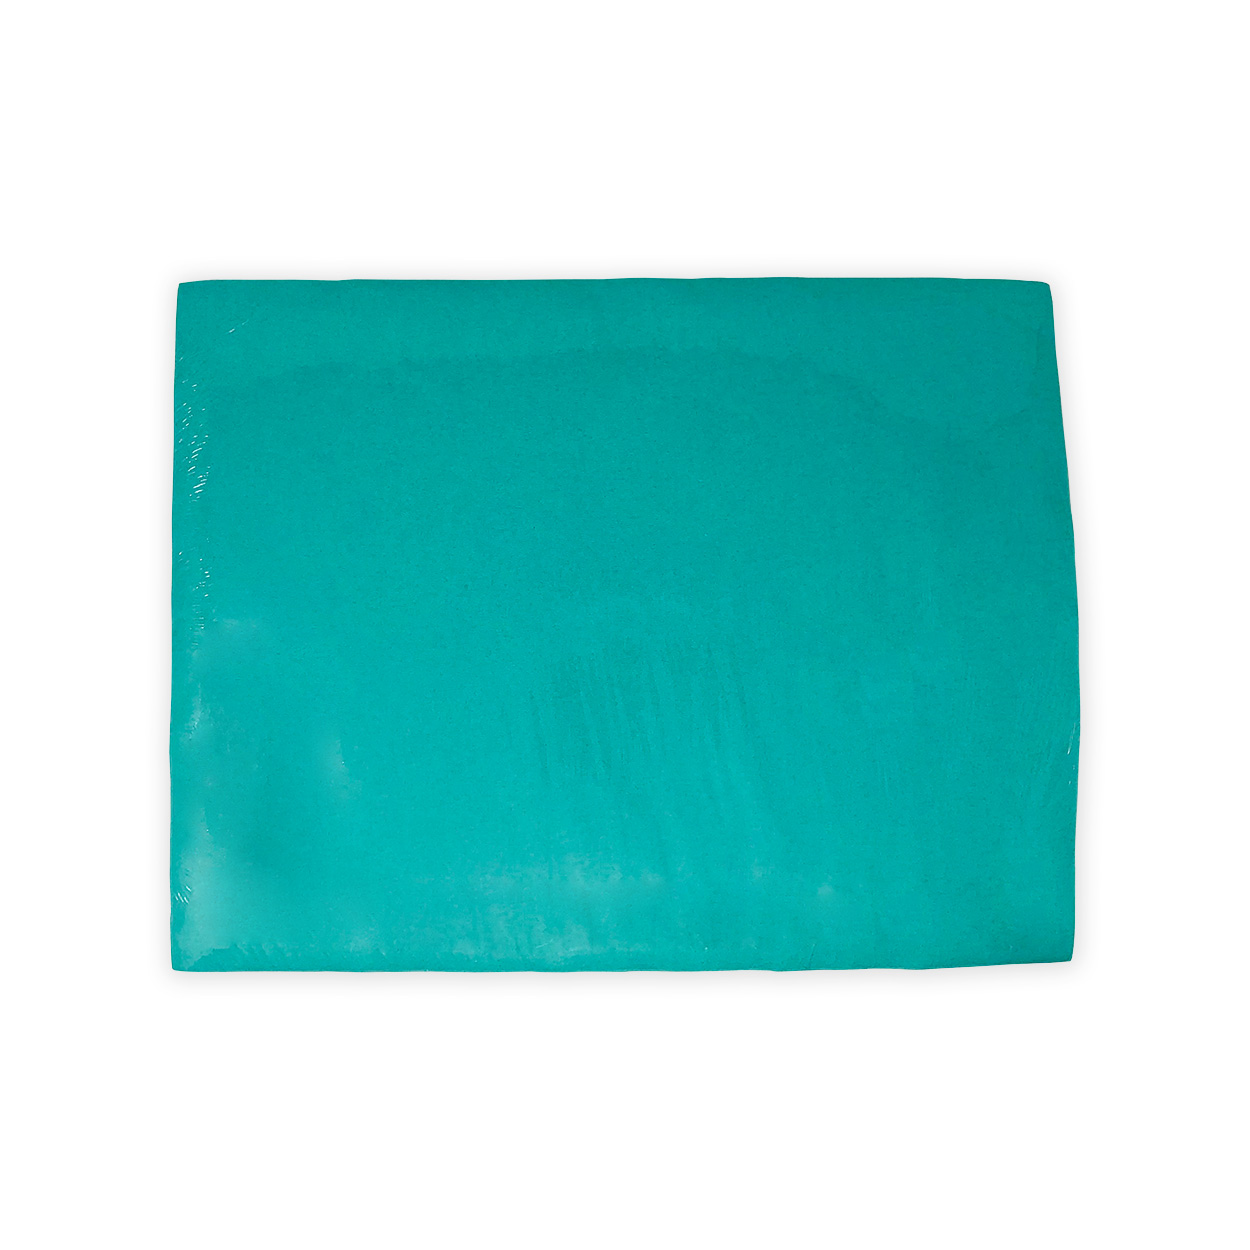 Tray-Filterpapier, grün Größe: 28 x 36 cm - 1 Packung á 250 Blatt